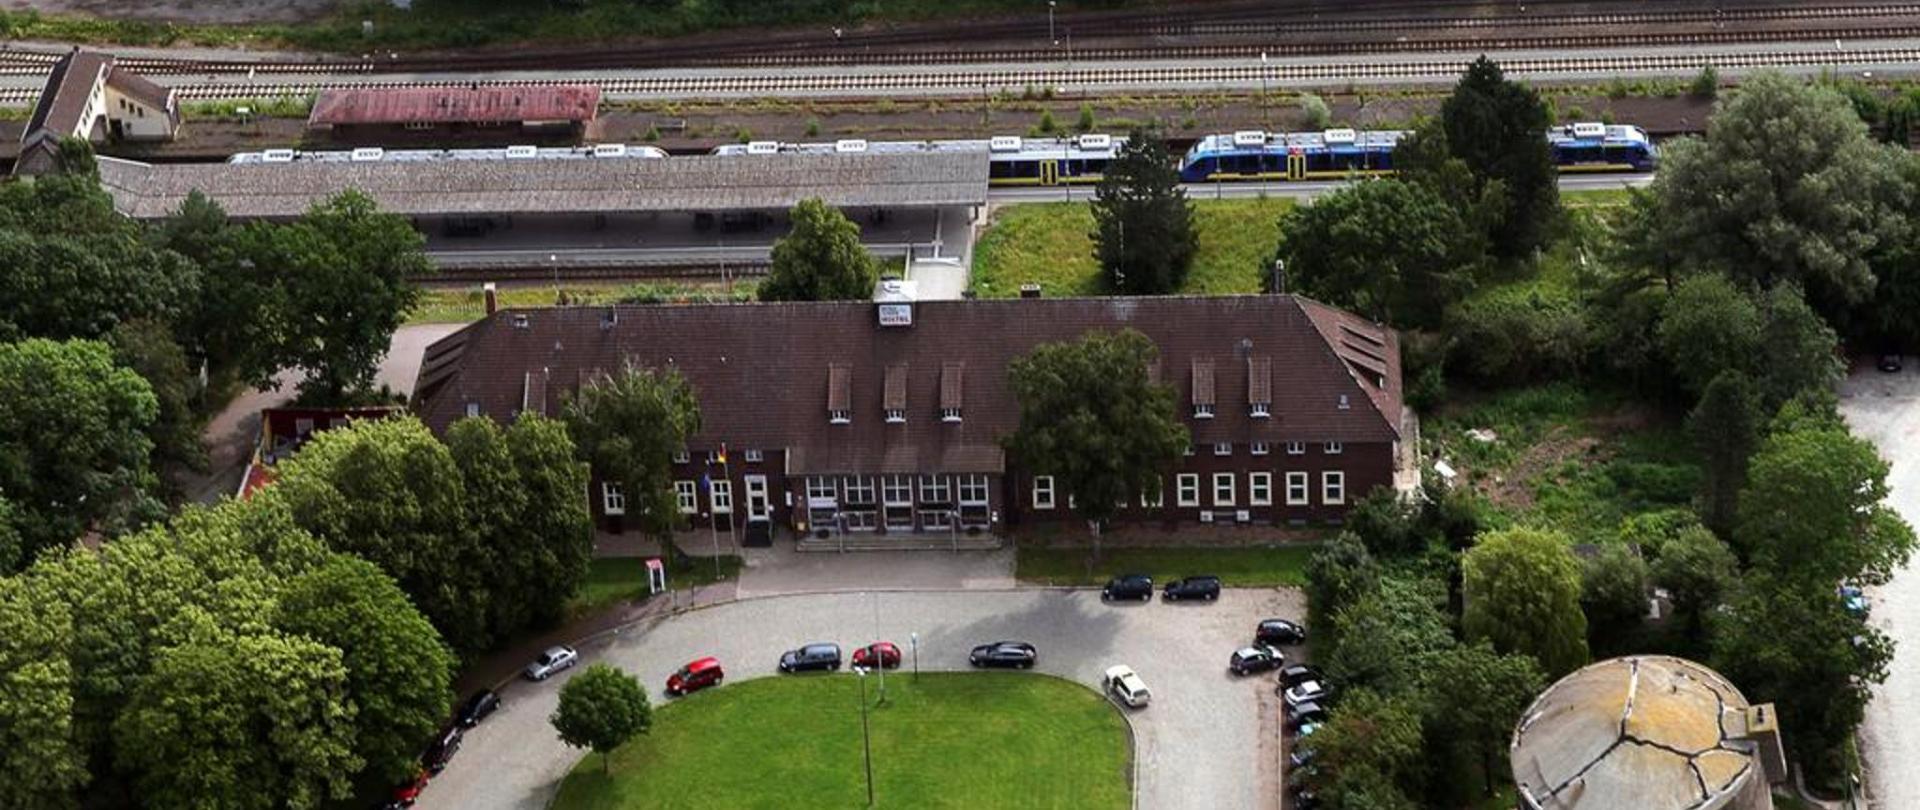 Nordseehostel am Bahnhof